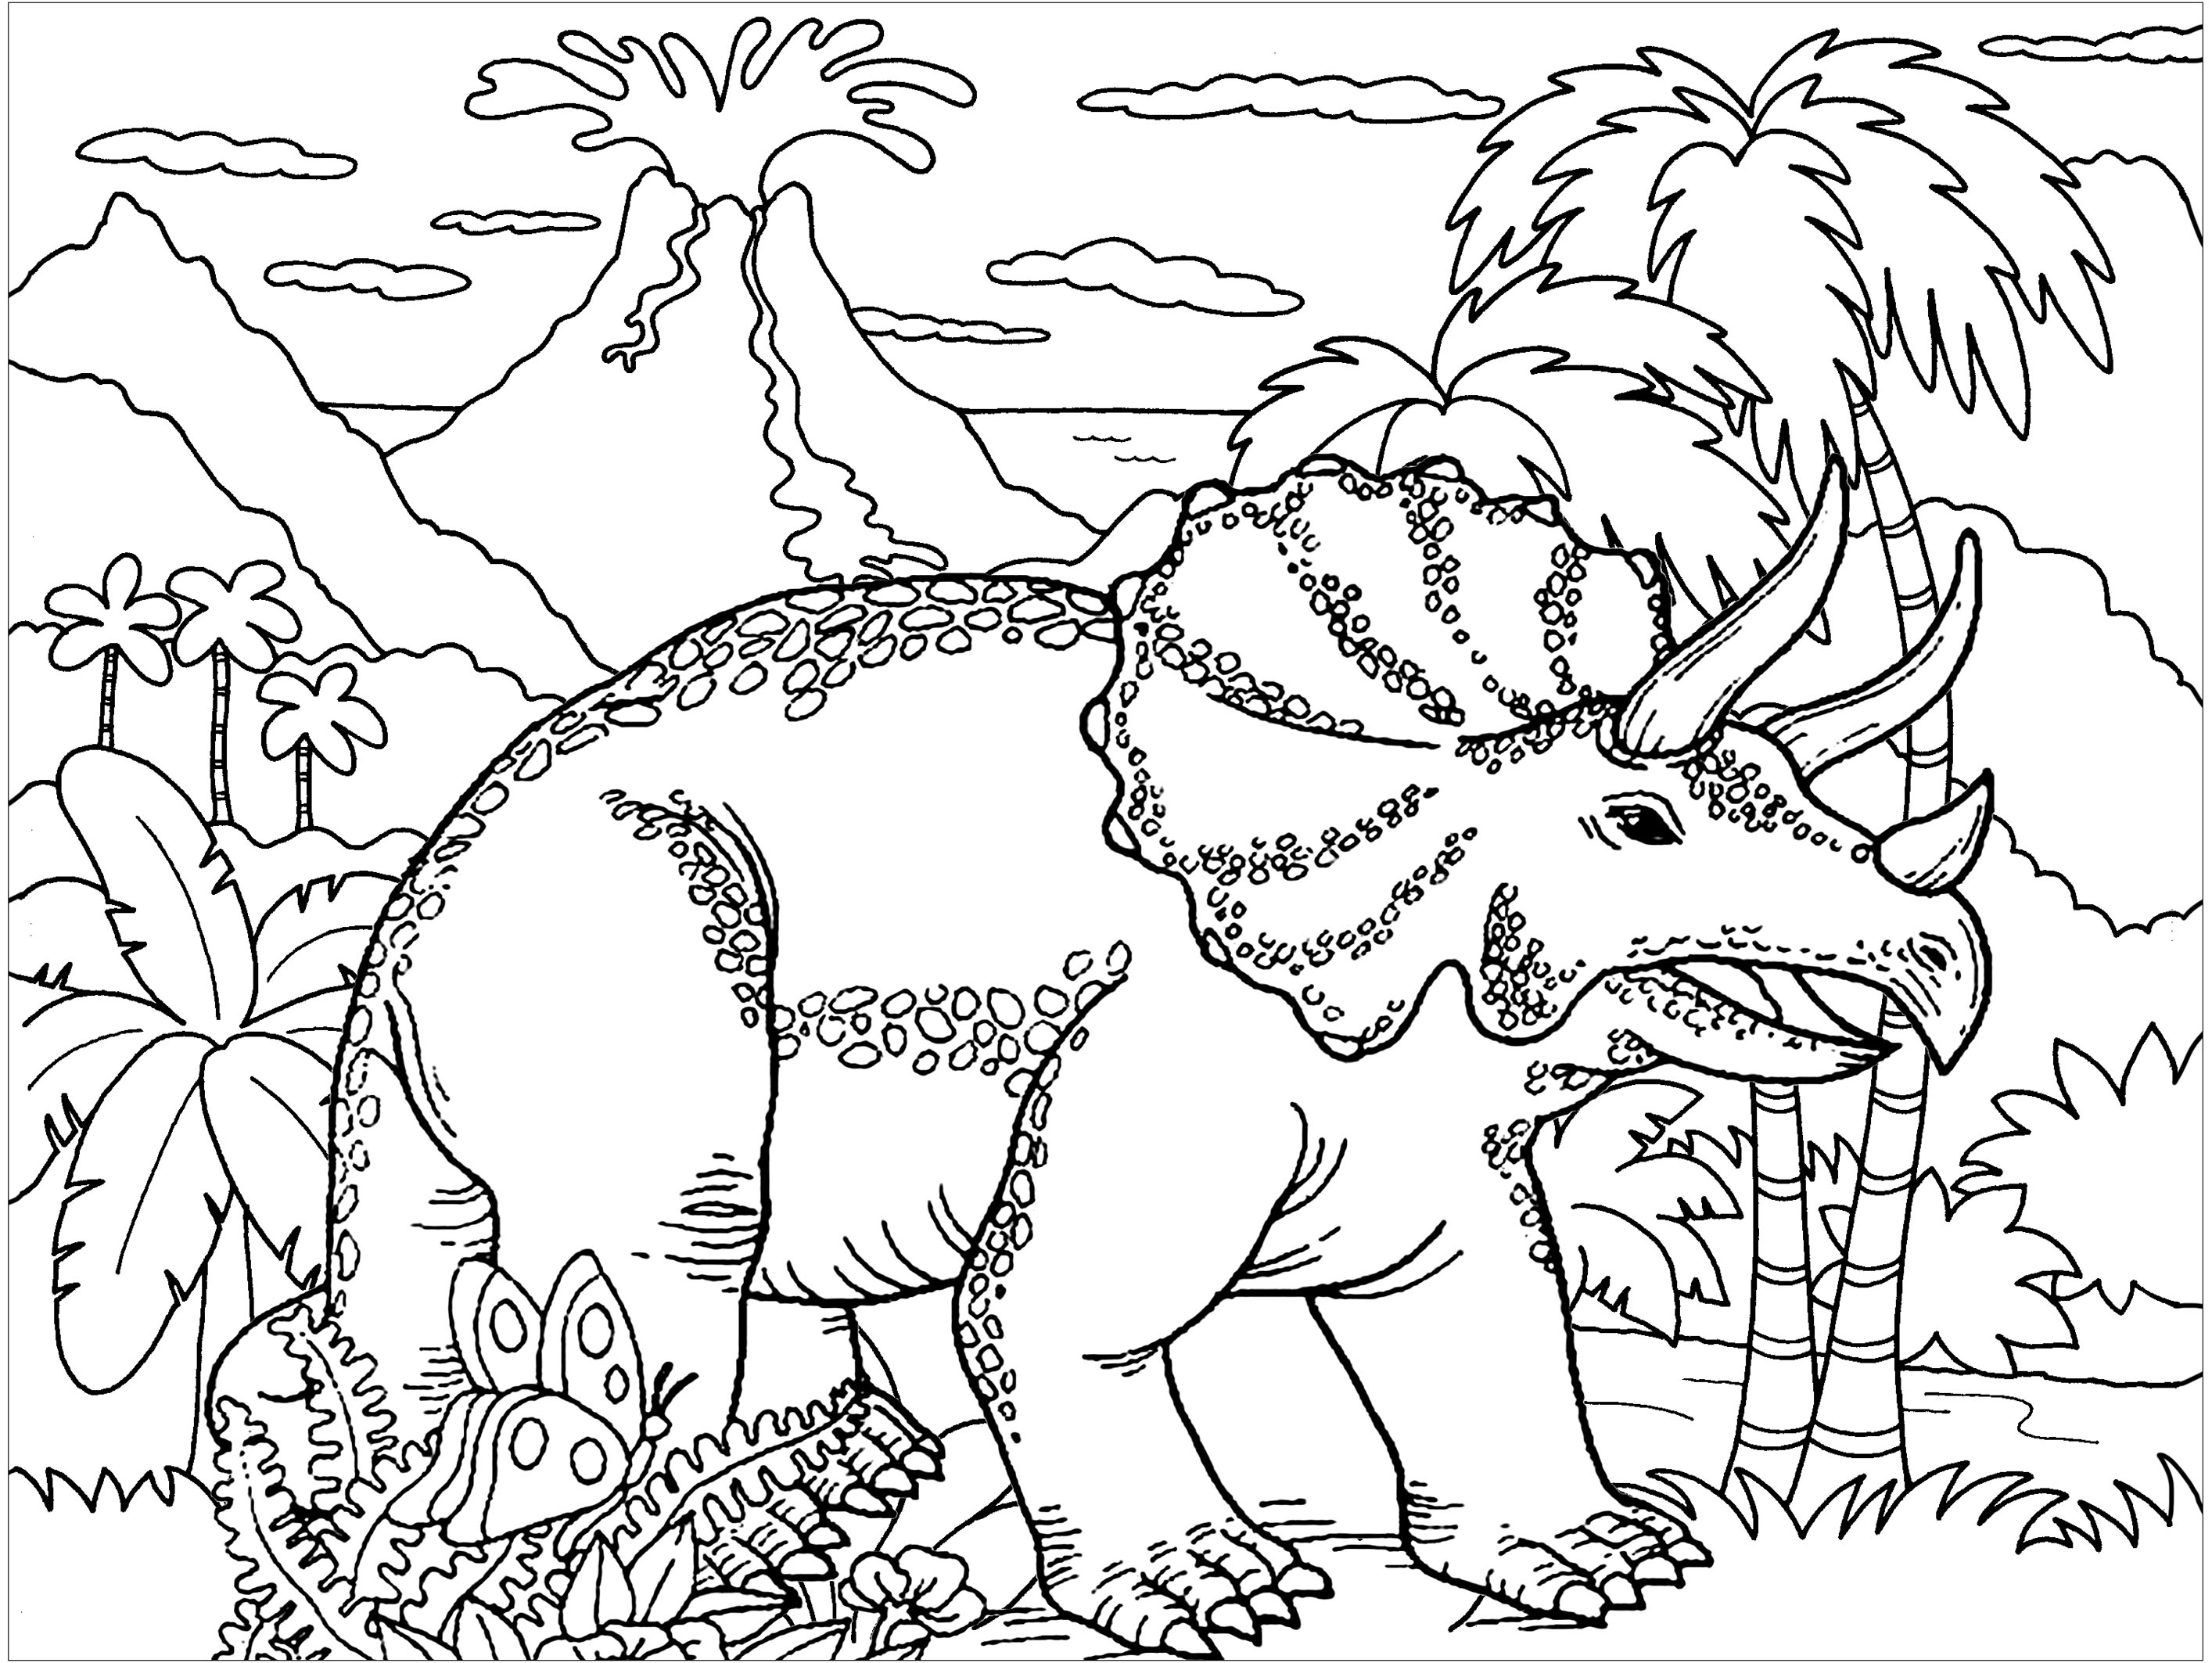 Coloriage Dinosaure Adulte.Triceratops Dinosaures Coloriages Difficiles Pour Adultes